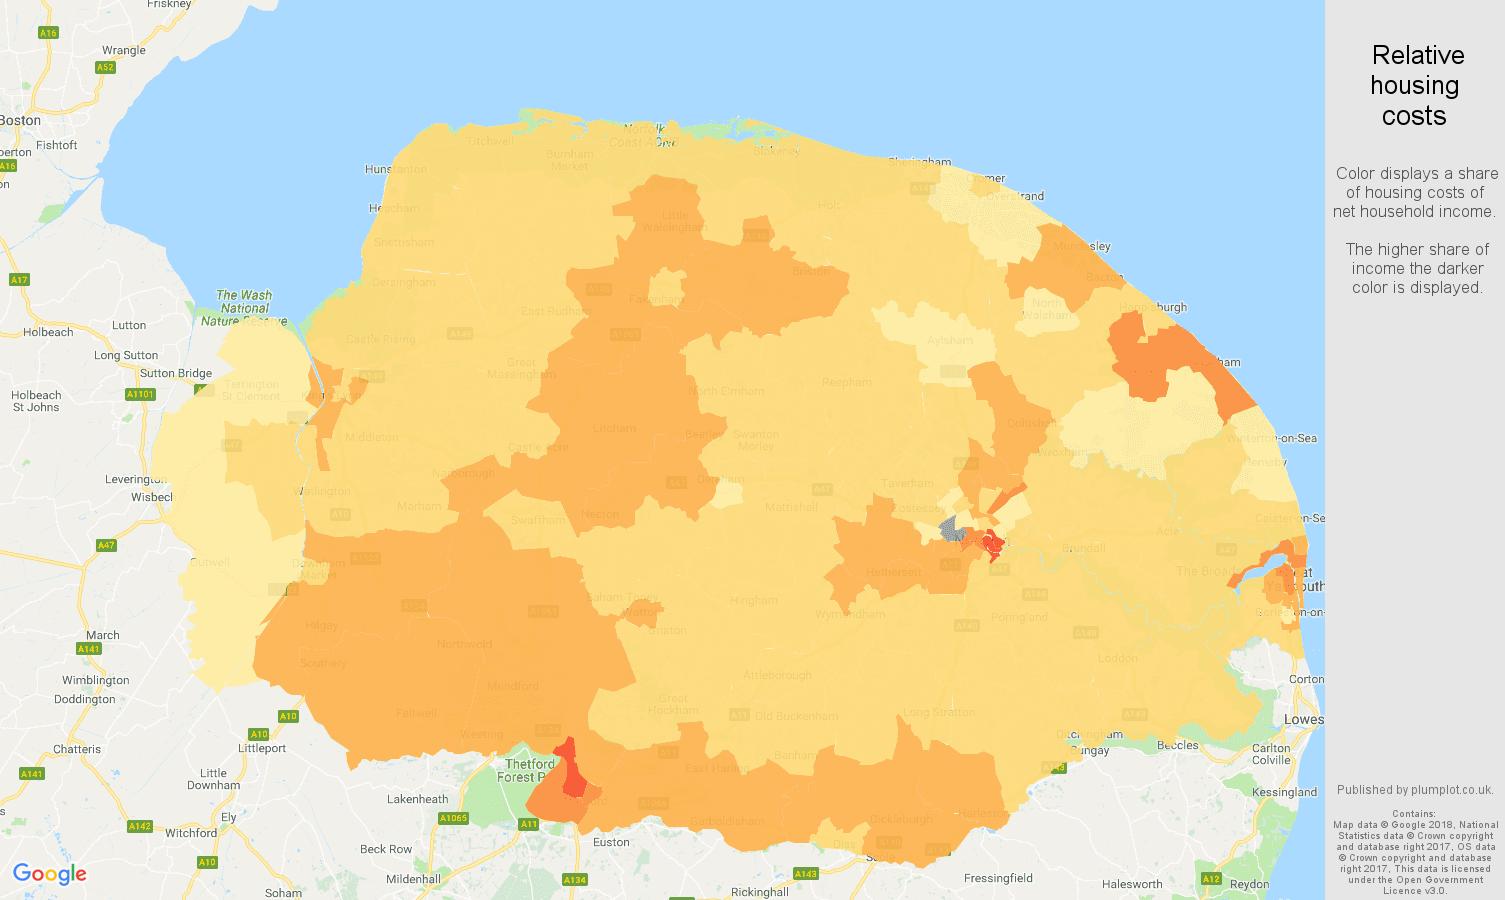 Norfolk relative housing costs map